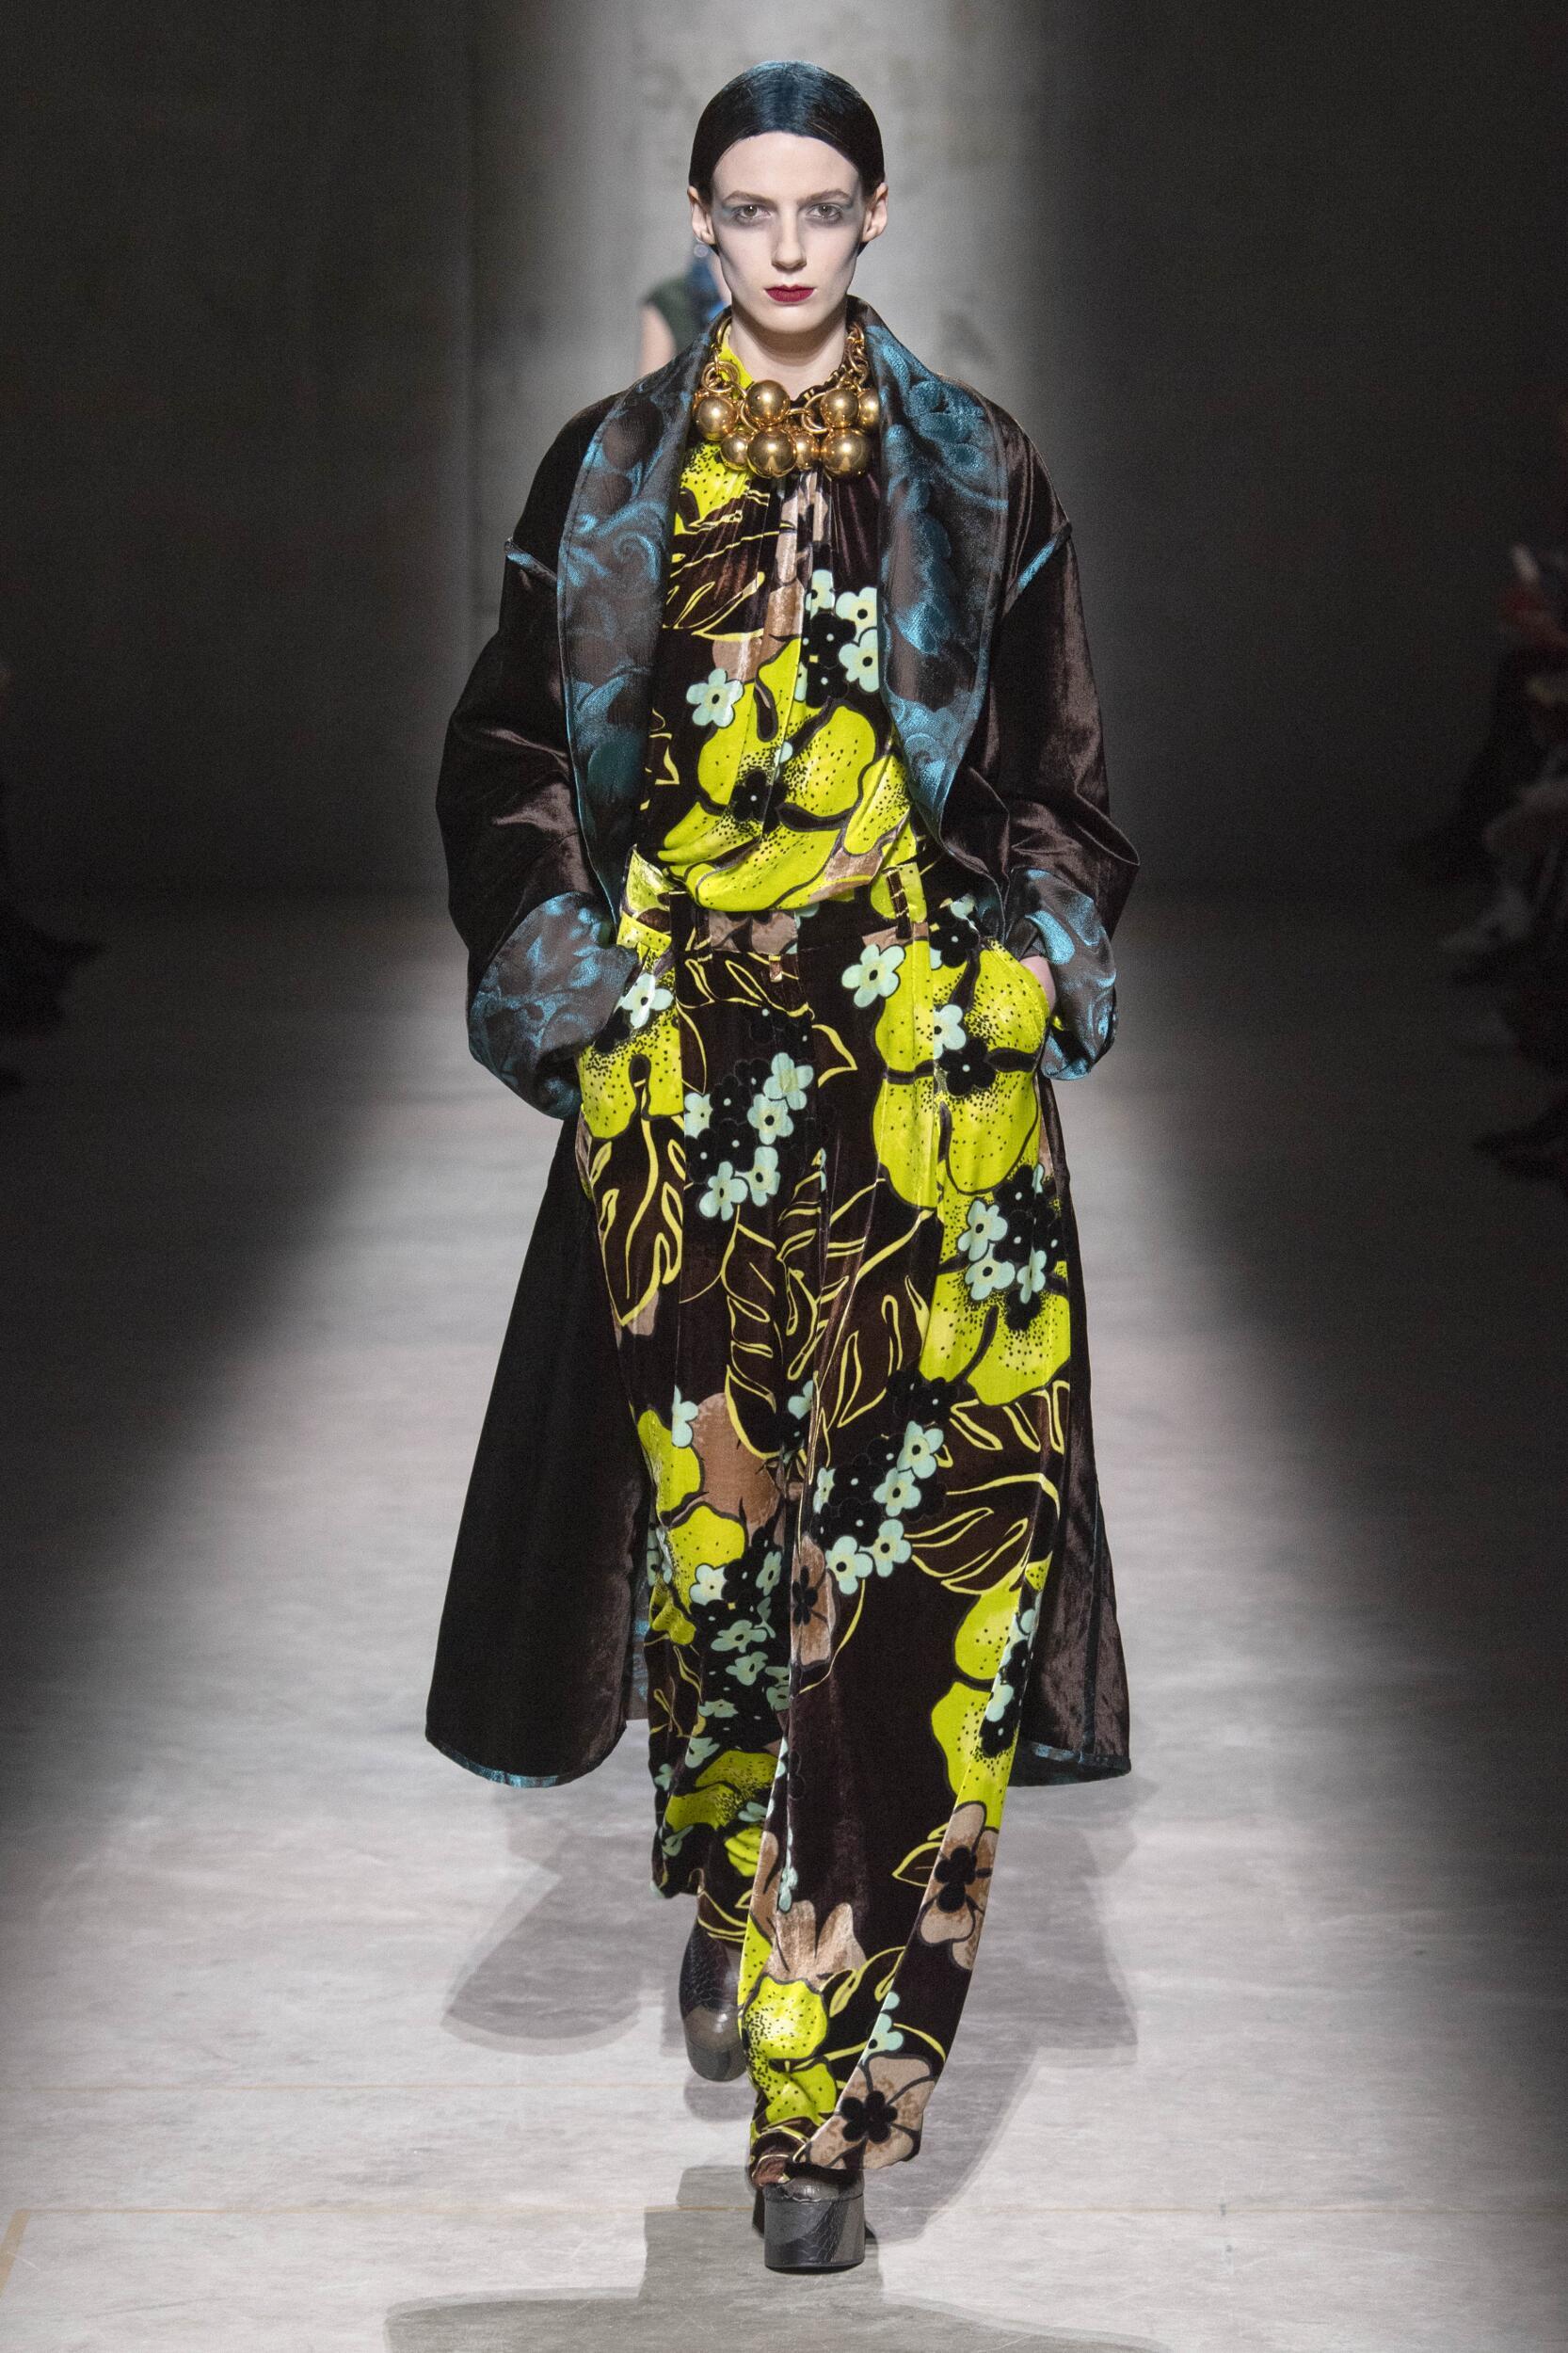 Fashion Model Dries Van Noten Catwalk